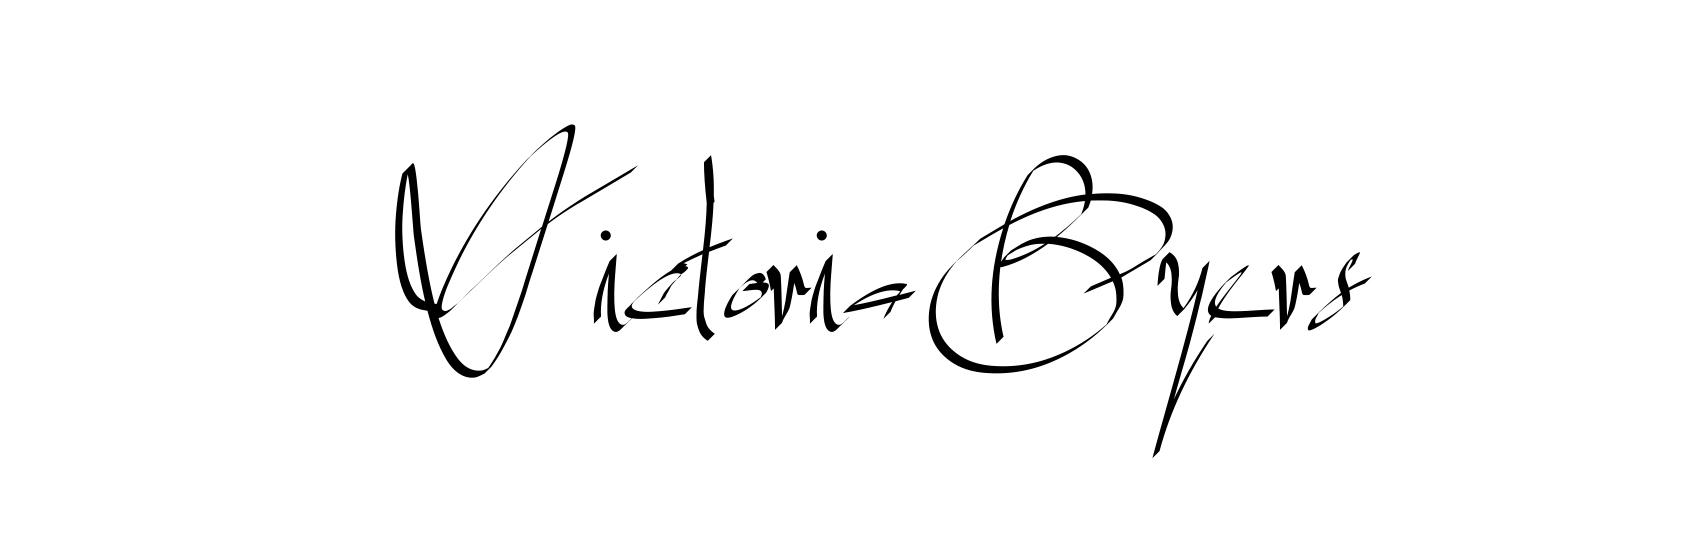 Victoria Byers Signature